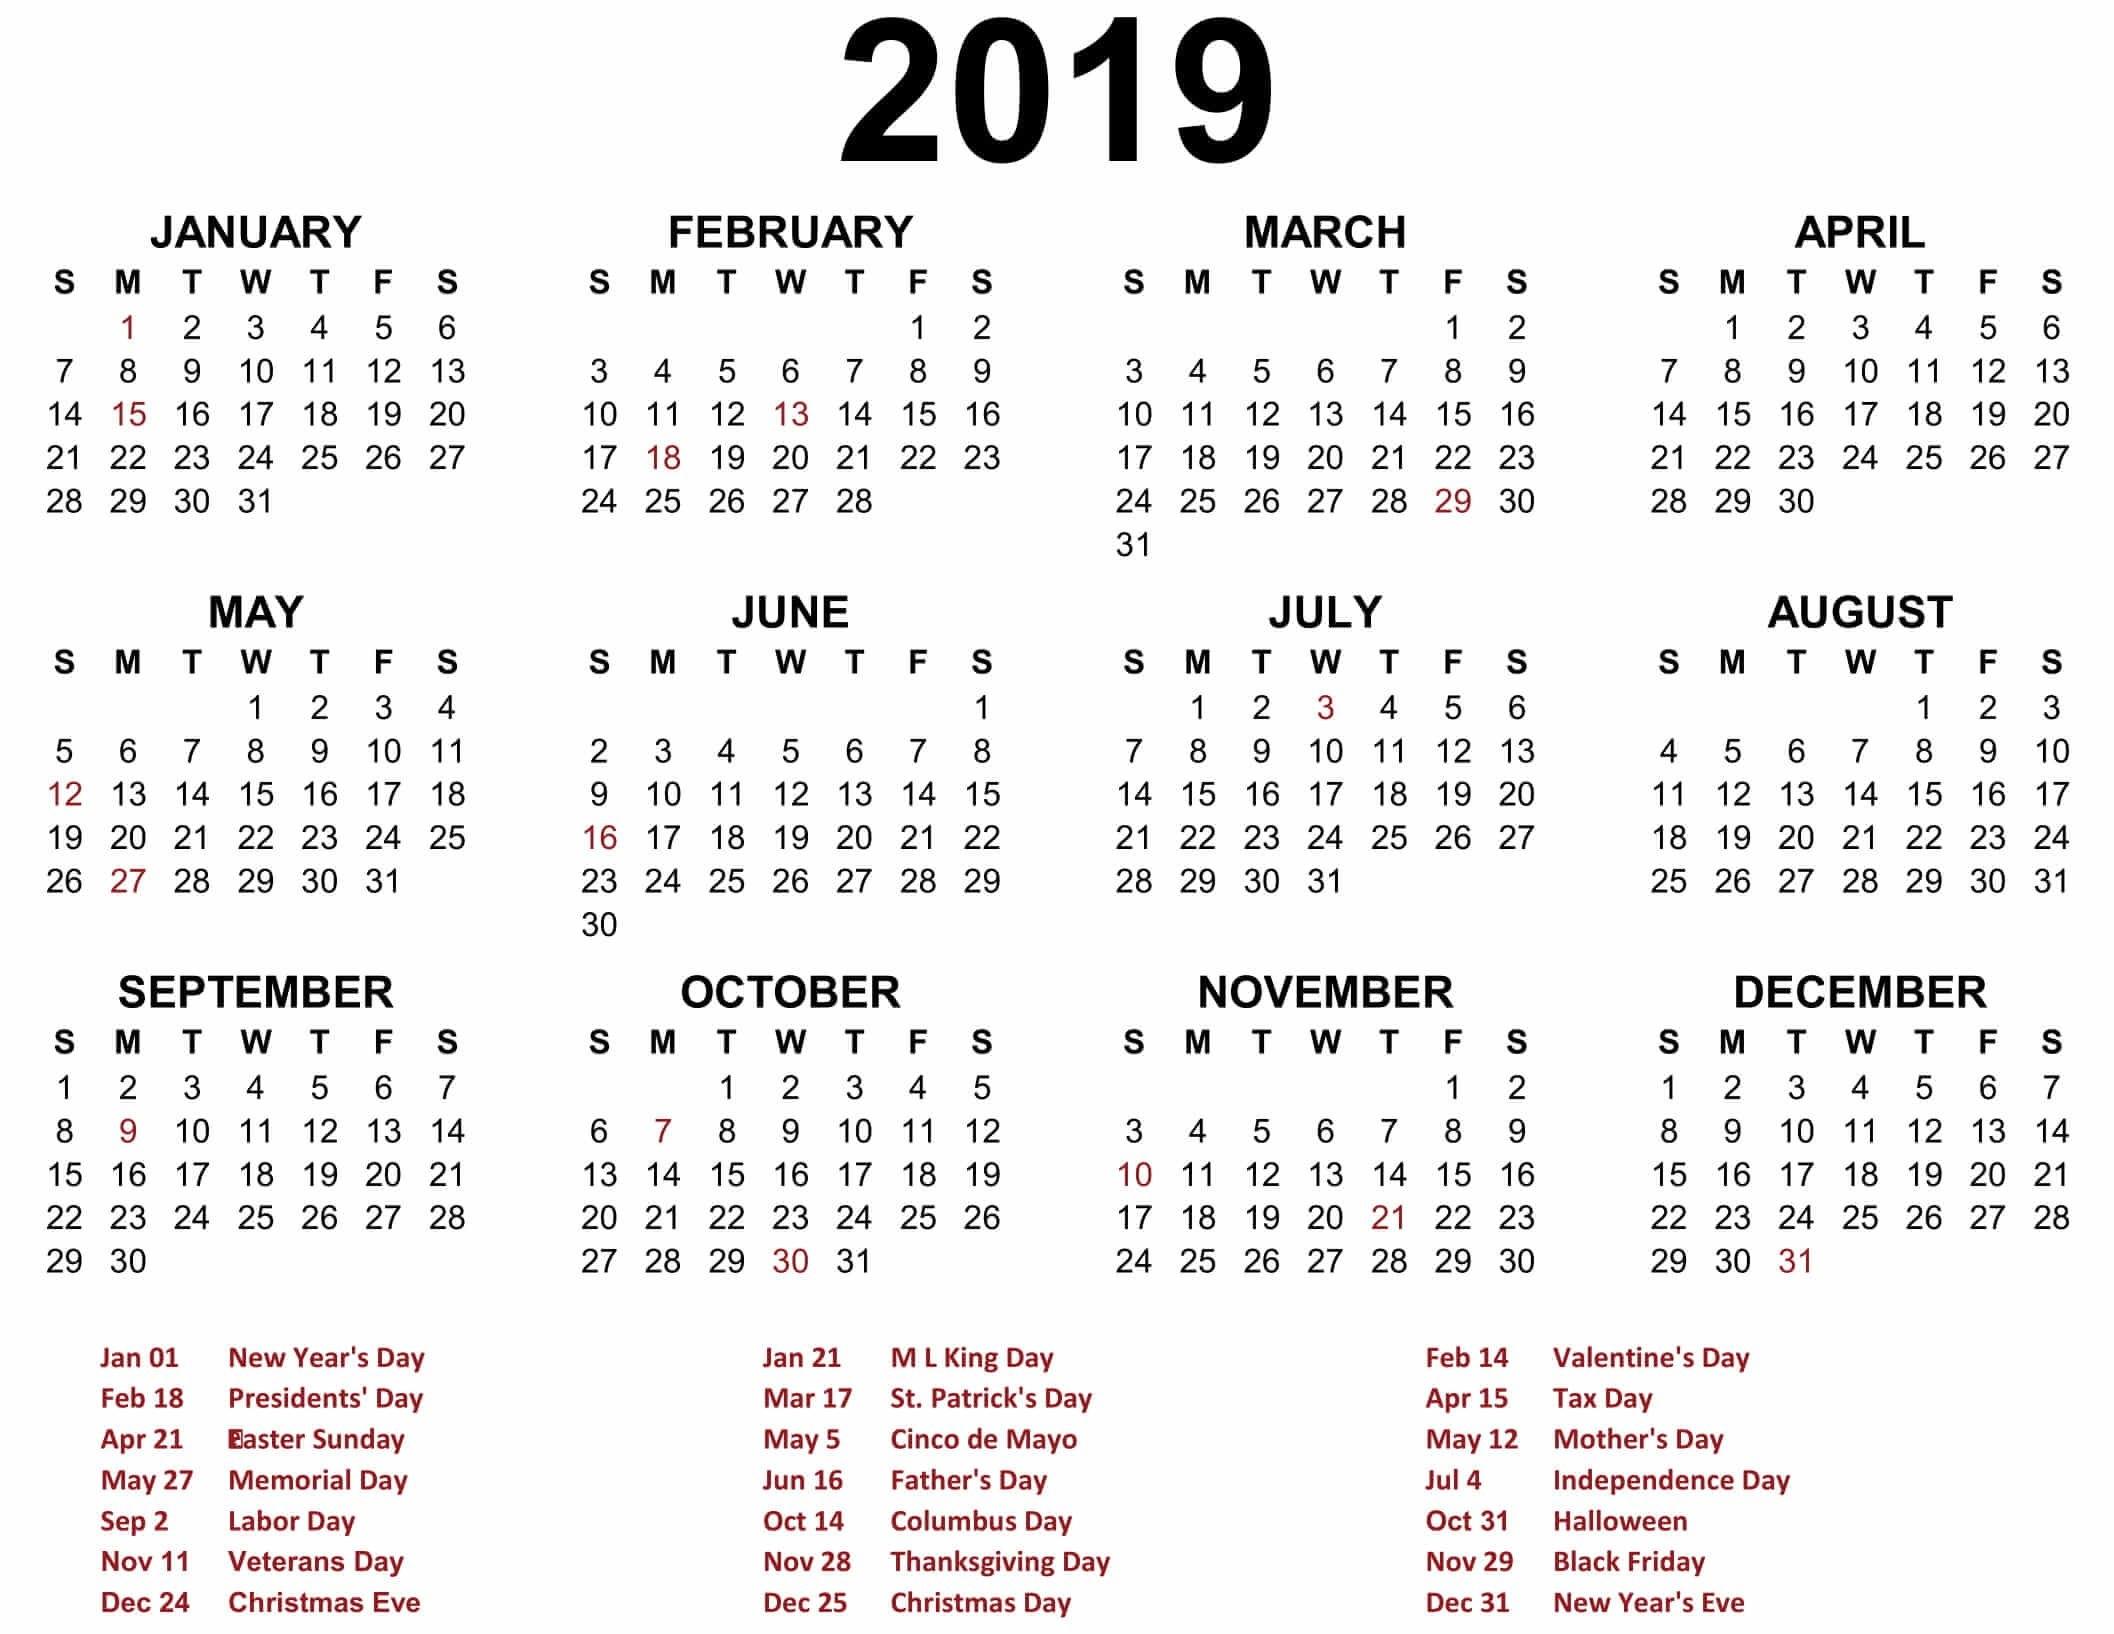 Printable Blank 2019 Calendar Templates - Calenndar Picture Of A 2019 Calendar